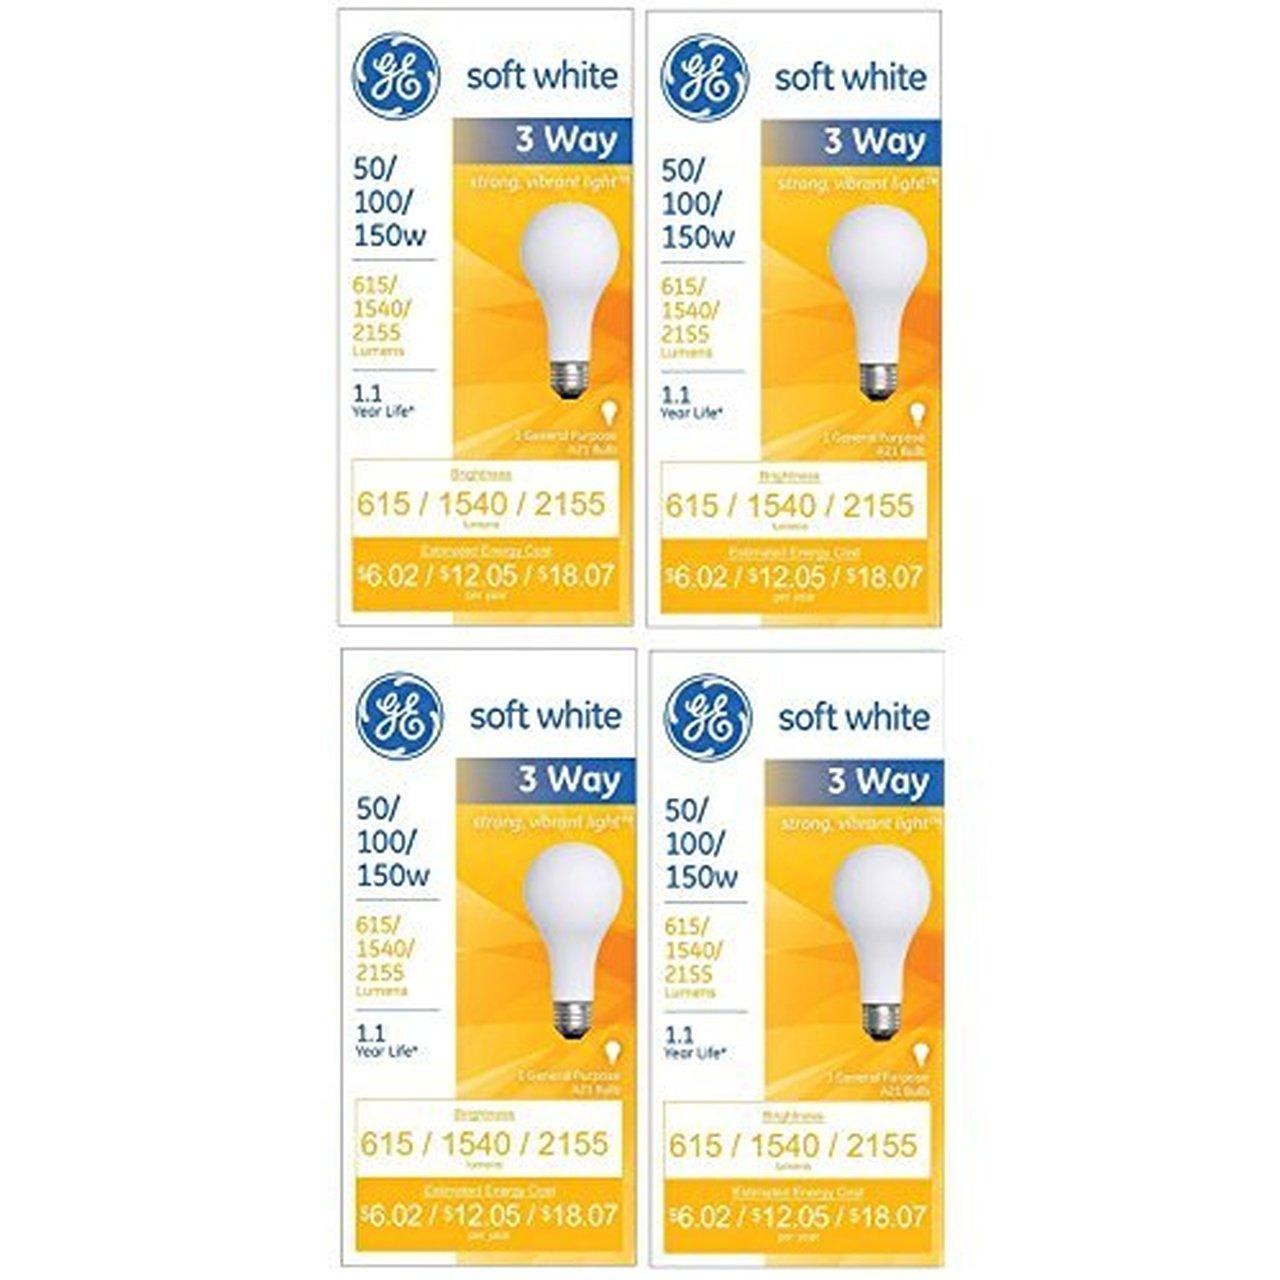 GE 97494 Lighting 50/100/150-Watt, 3-Way Light Bulb, Soft White, 4-Pack H&PC-71059